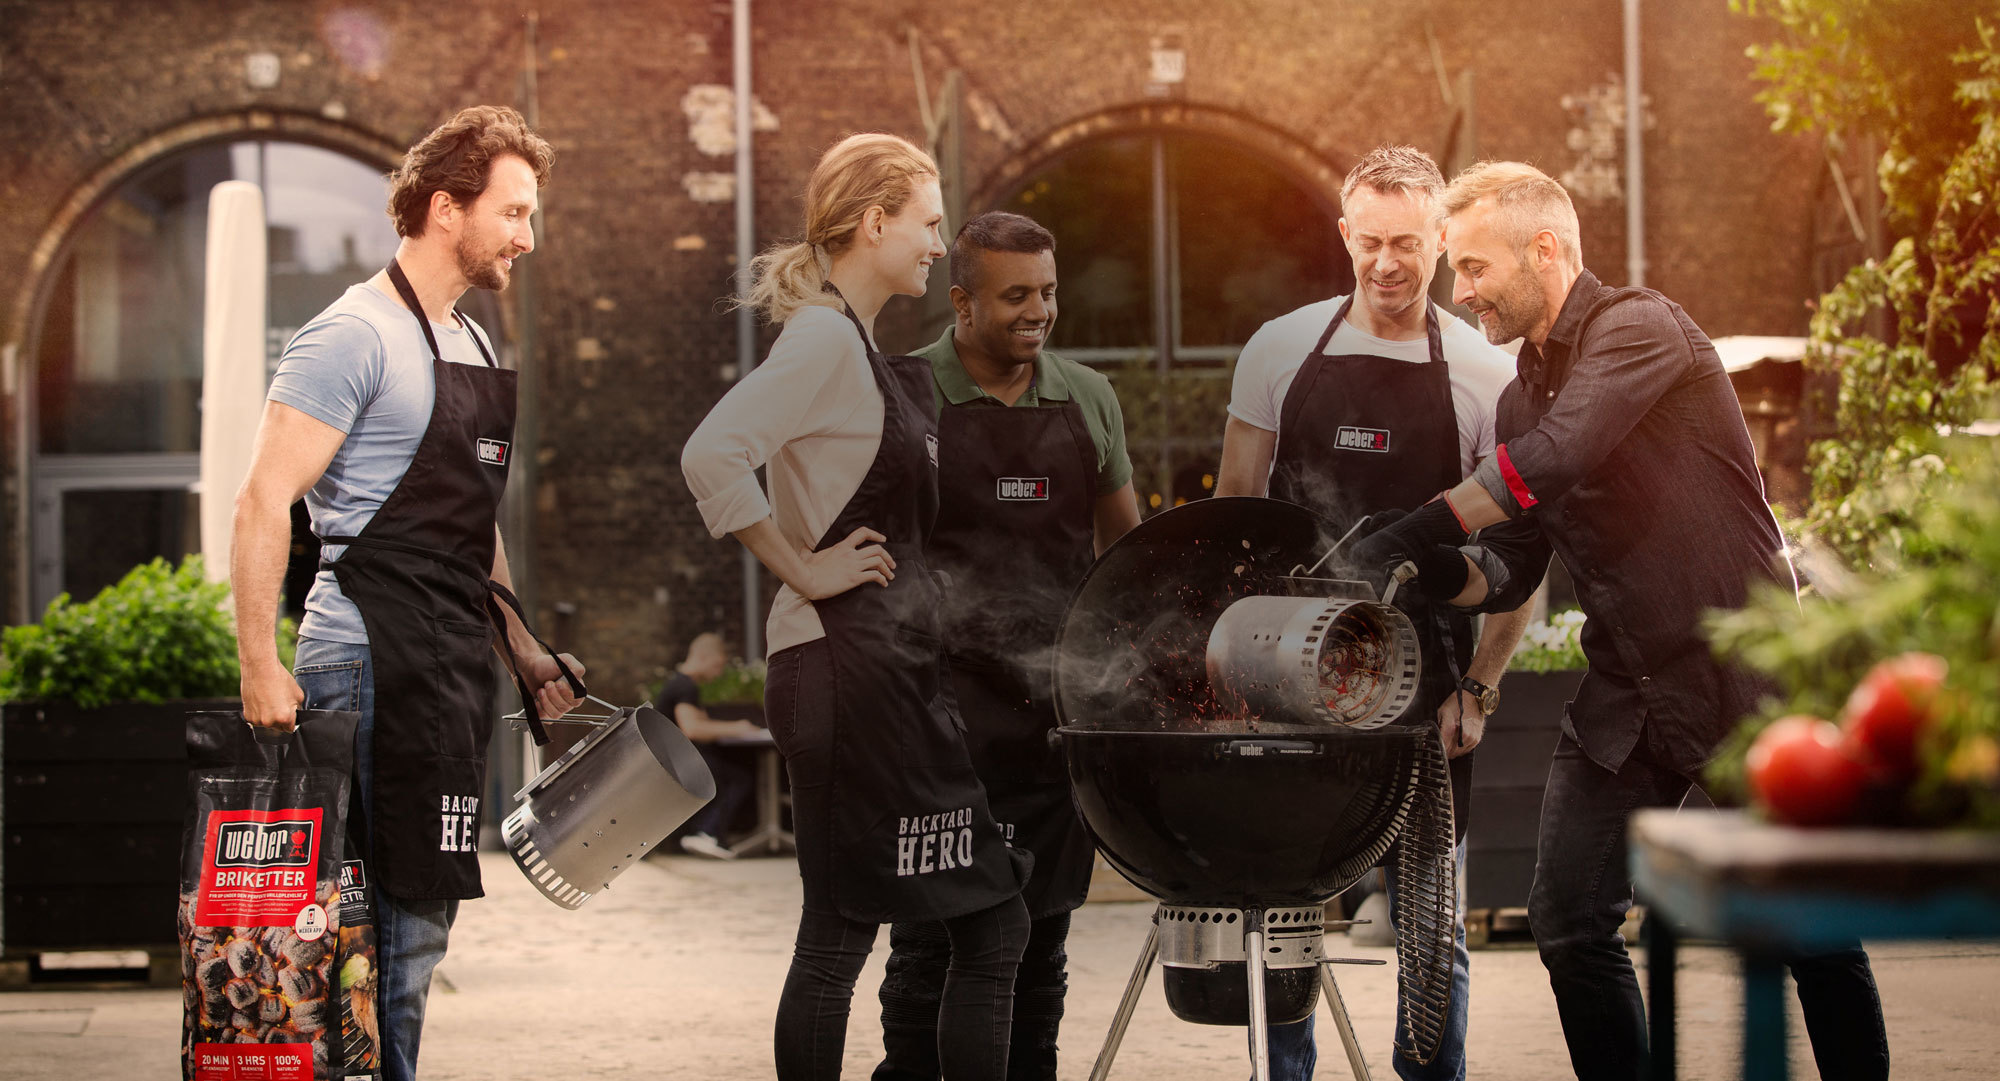 Billig Weber Gasgrill Tilbud : Weber grill weber danmarks officielle website